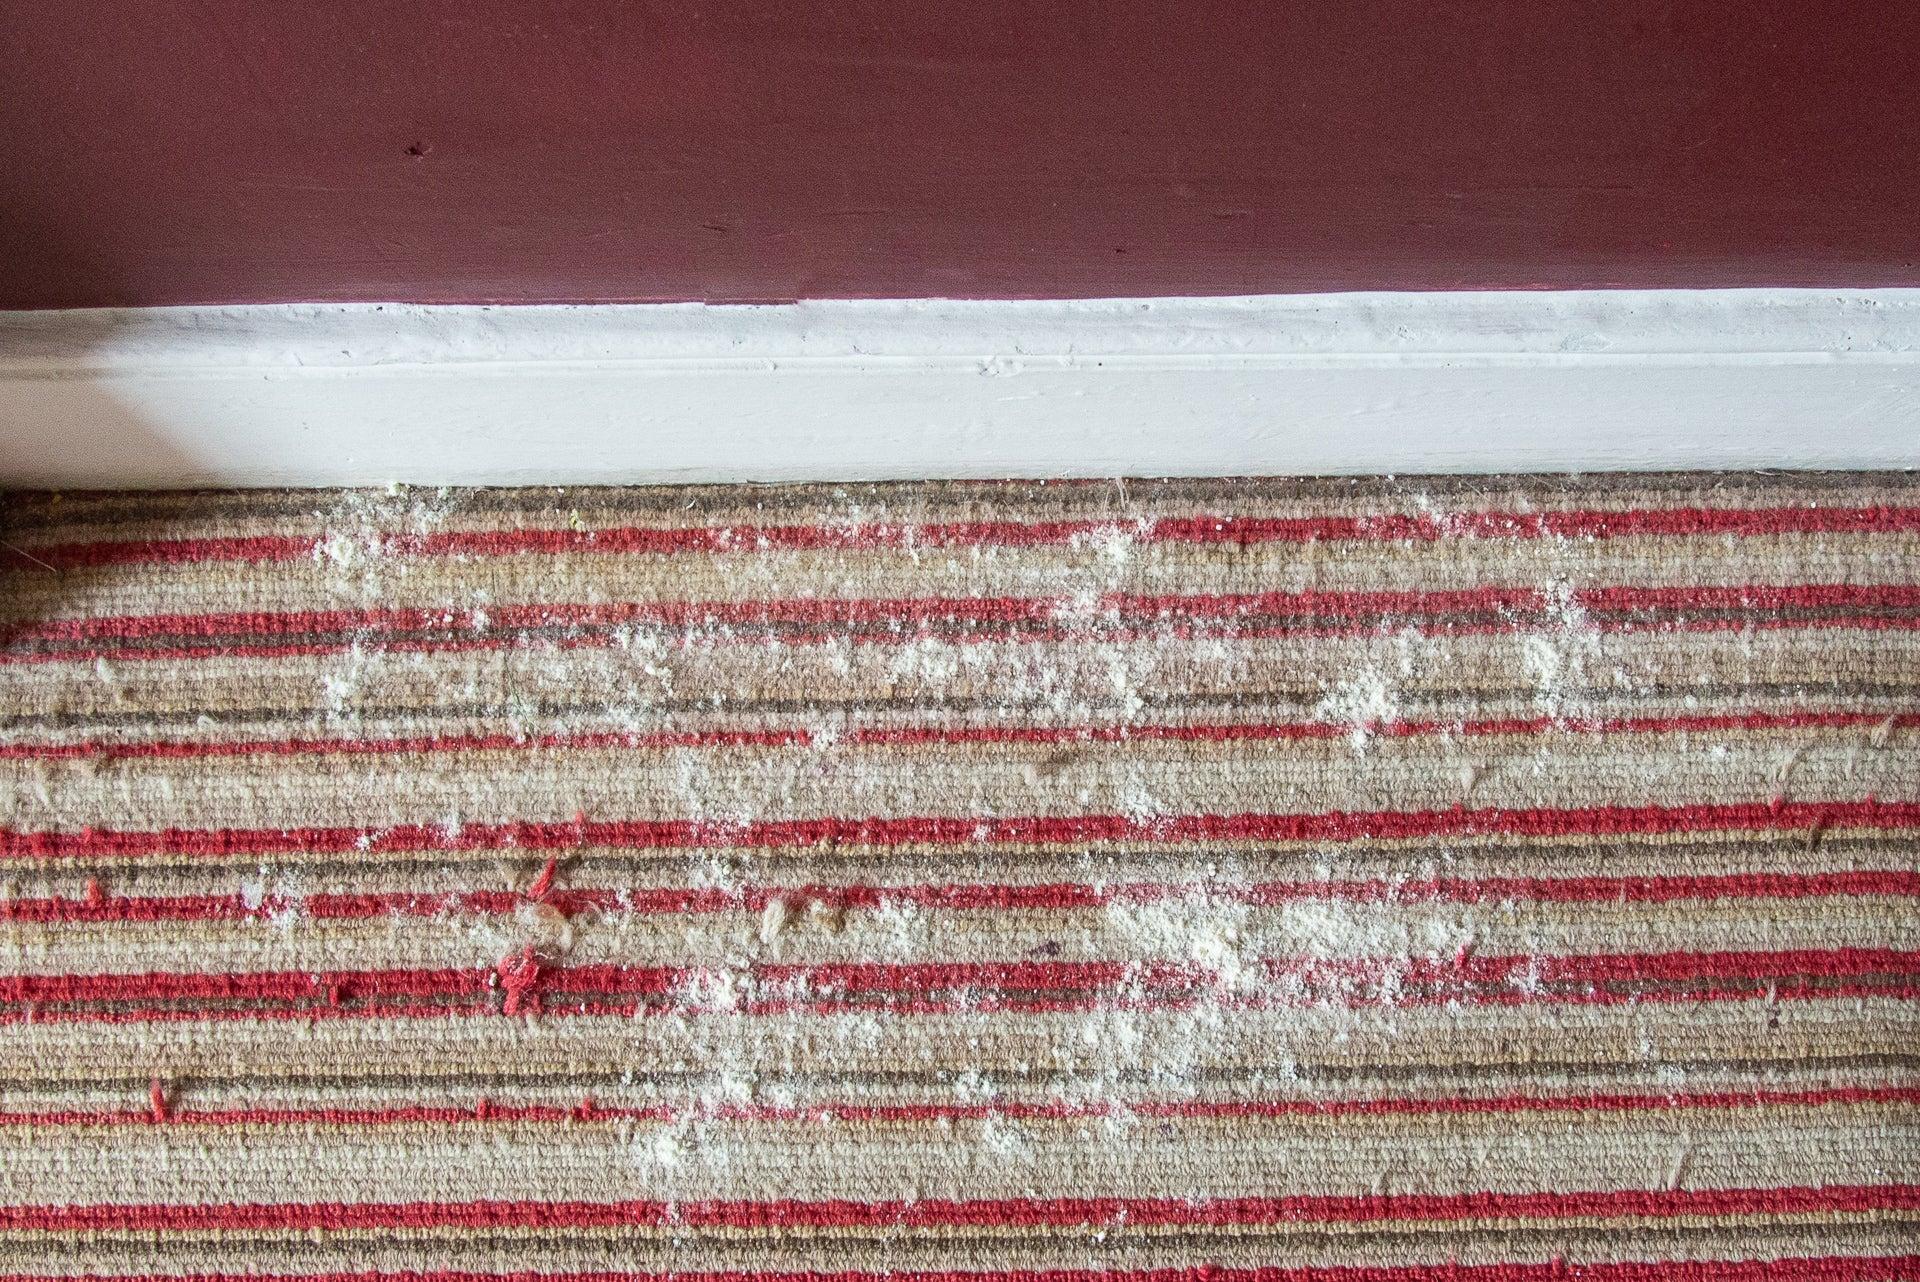 Vorwerk Kobold VB100 dirty carpet